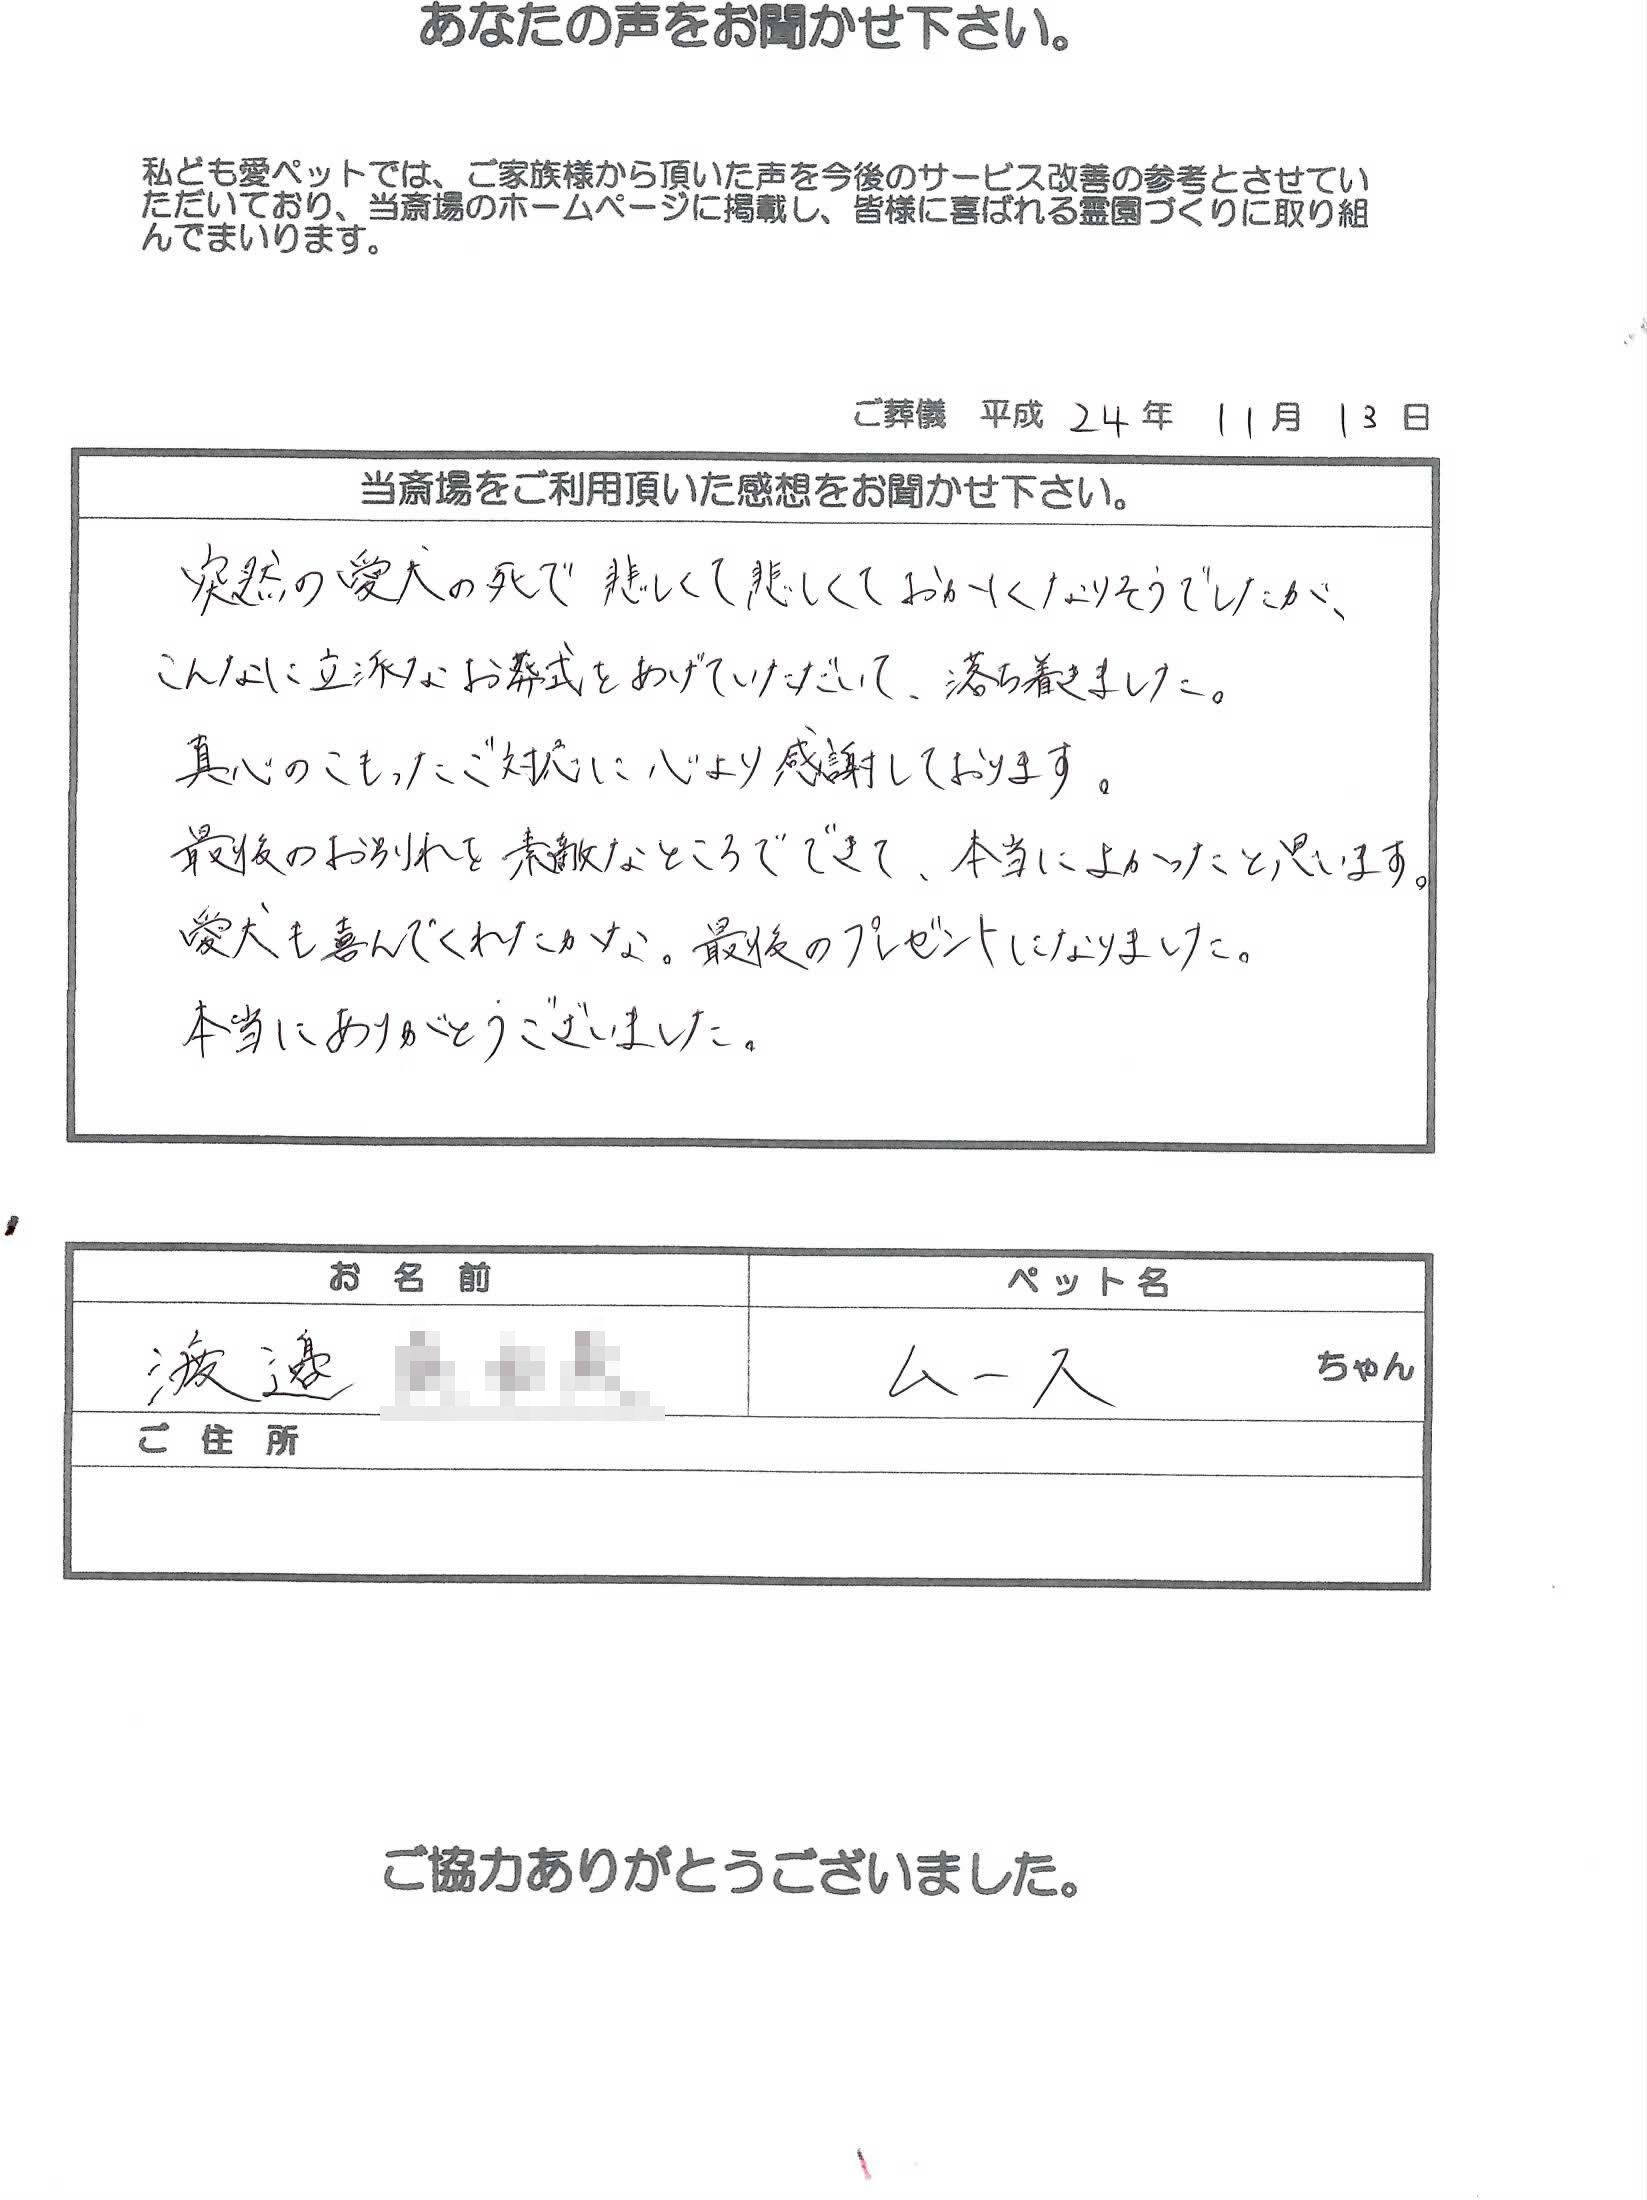 k121113-1.jpg